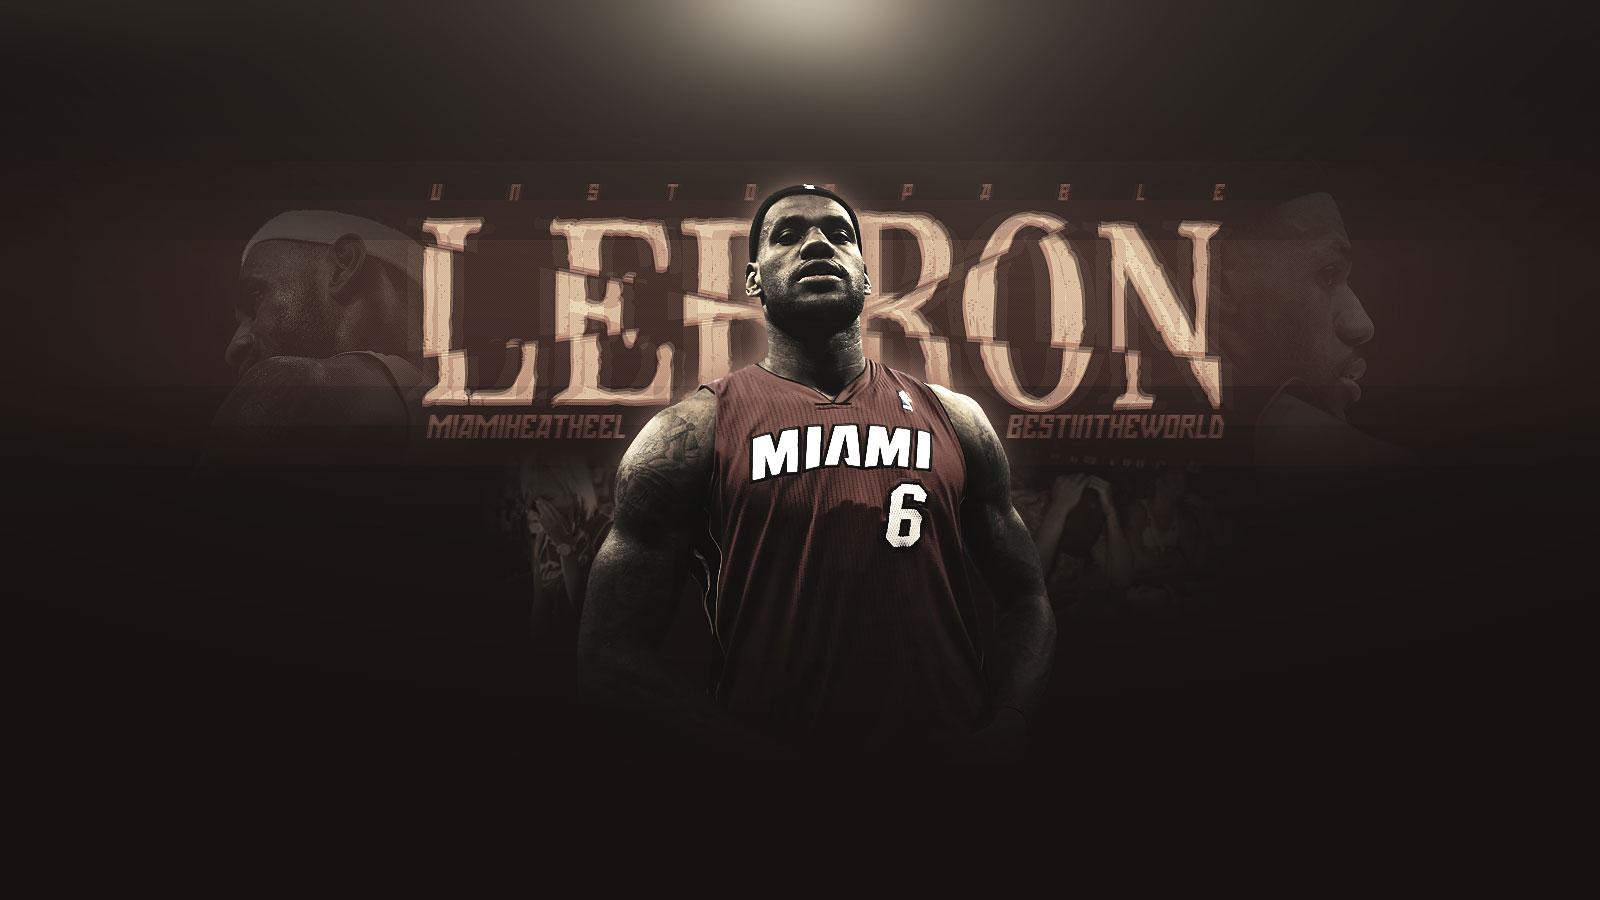 LeBron James Miami Heat 1600x900 Widescreen Wallpaper 1600x900